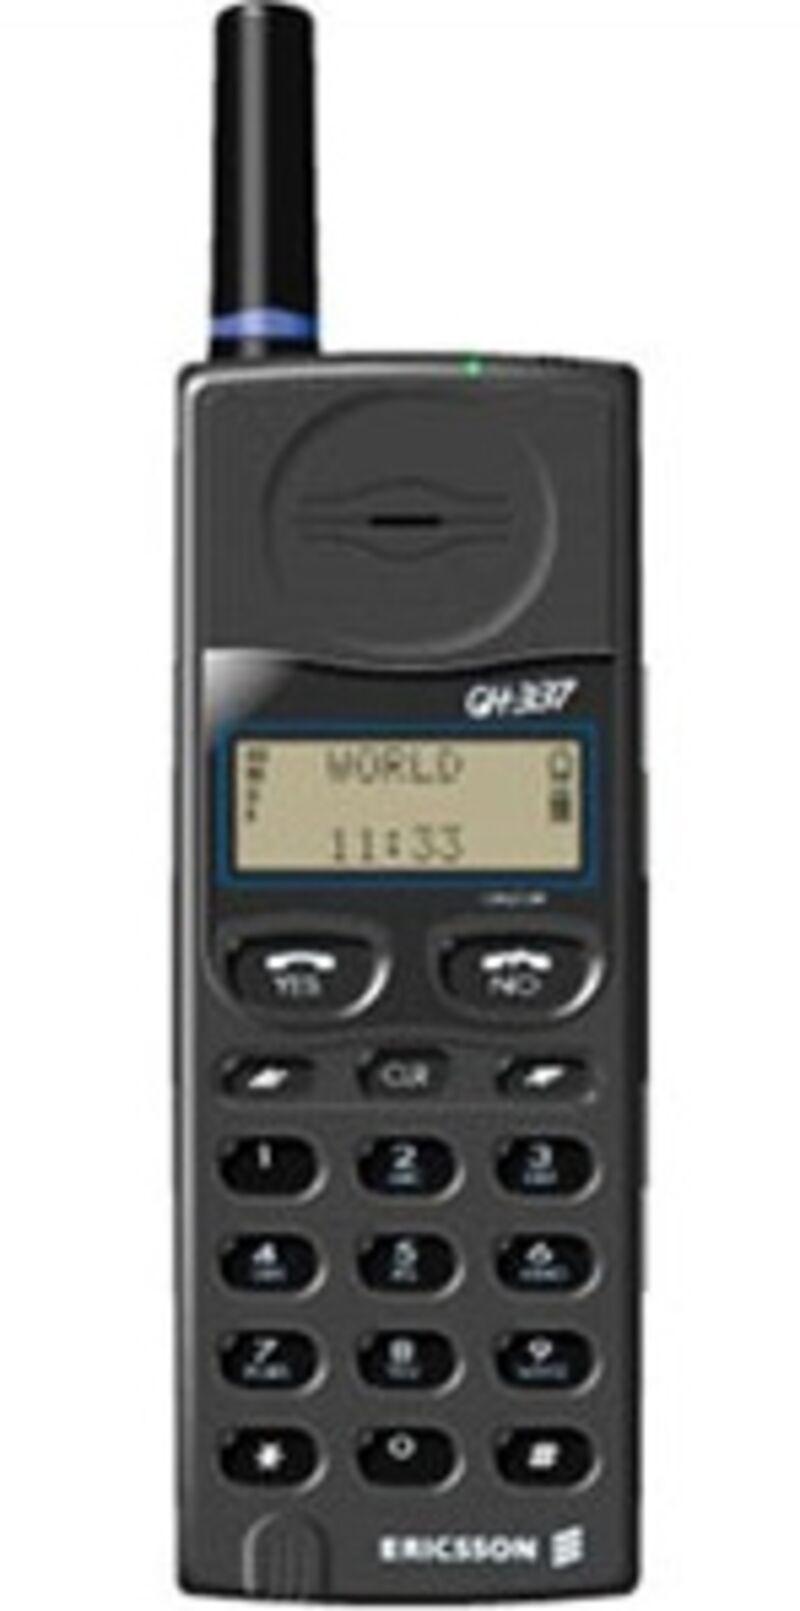 Ericsson GH 337-GSM